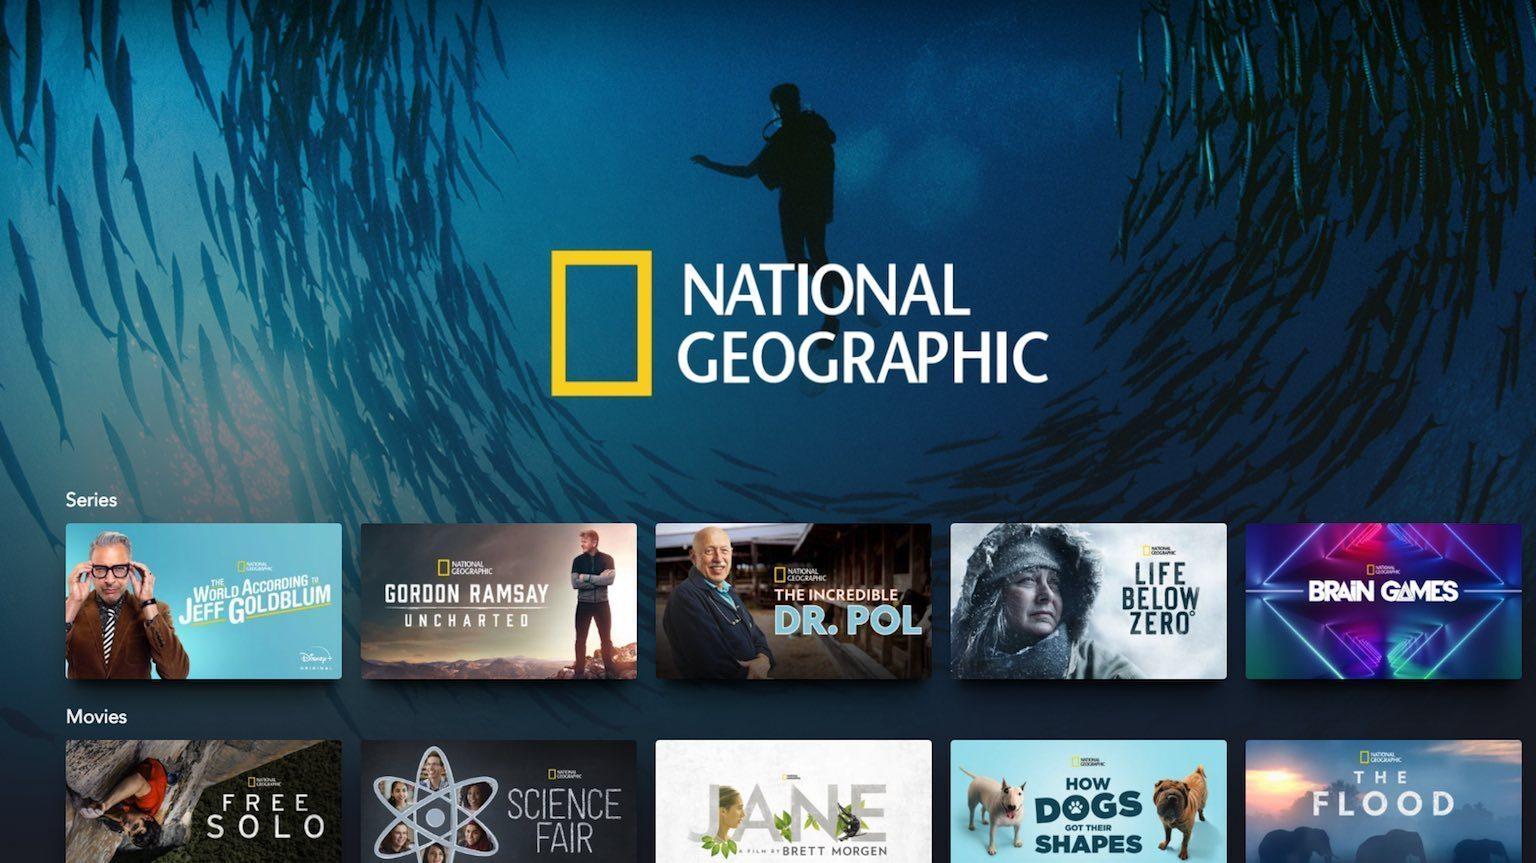 Disney+ National Geographic